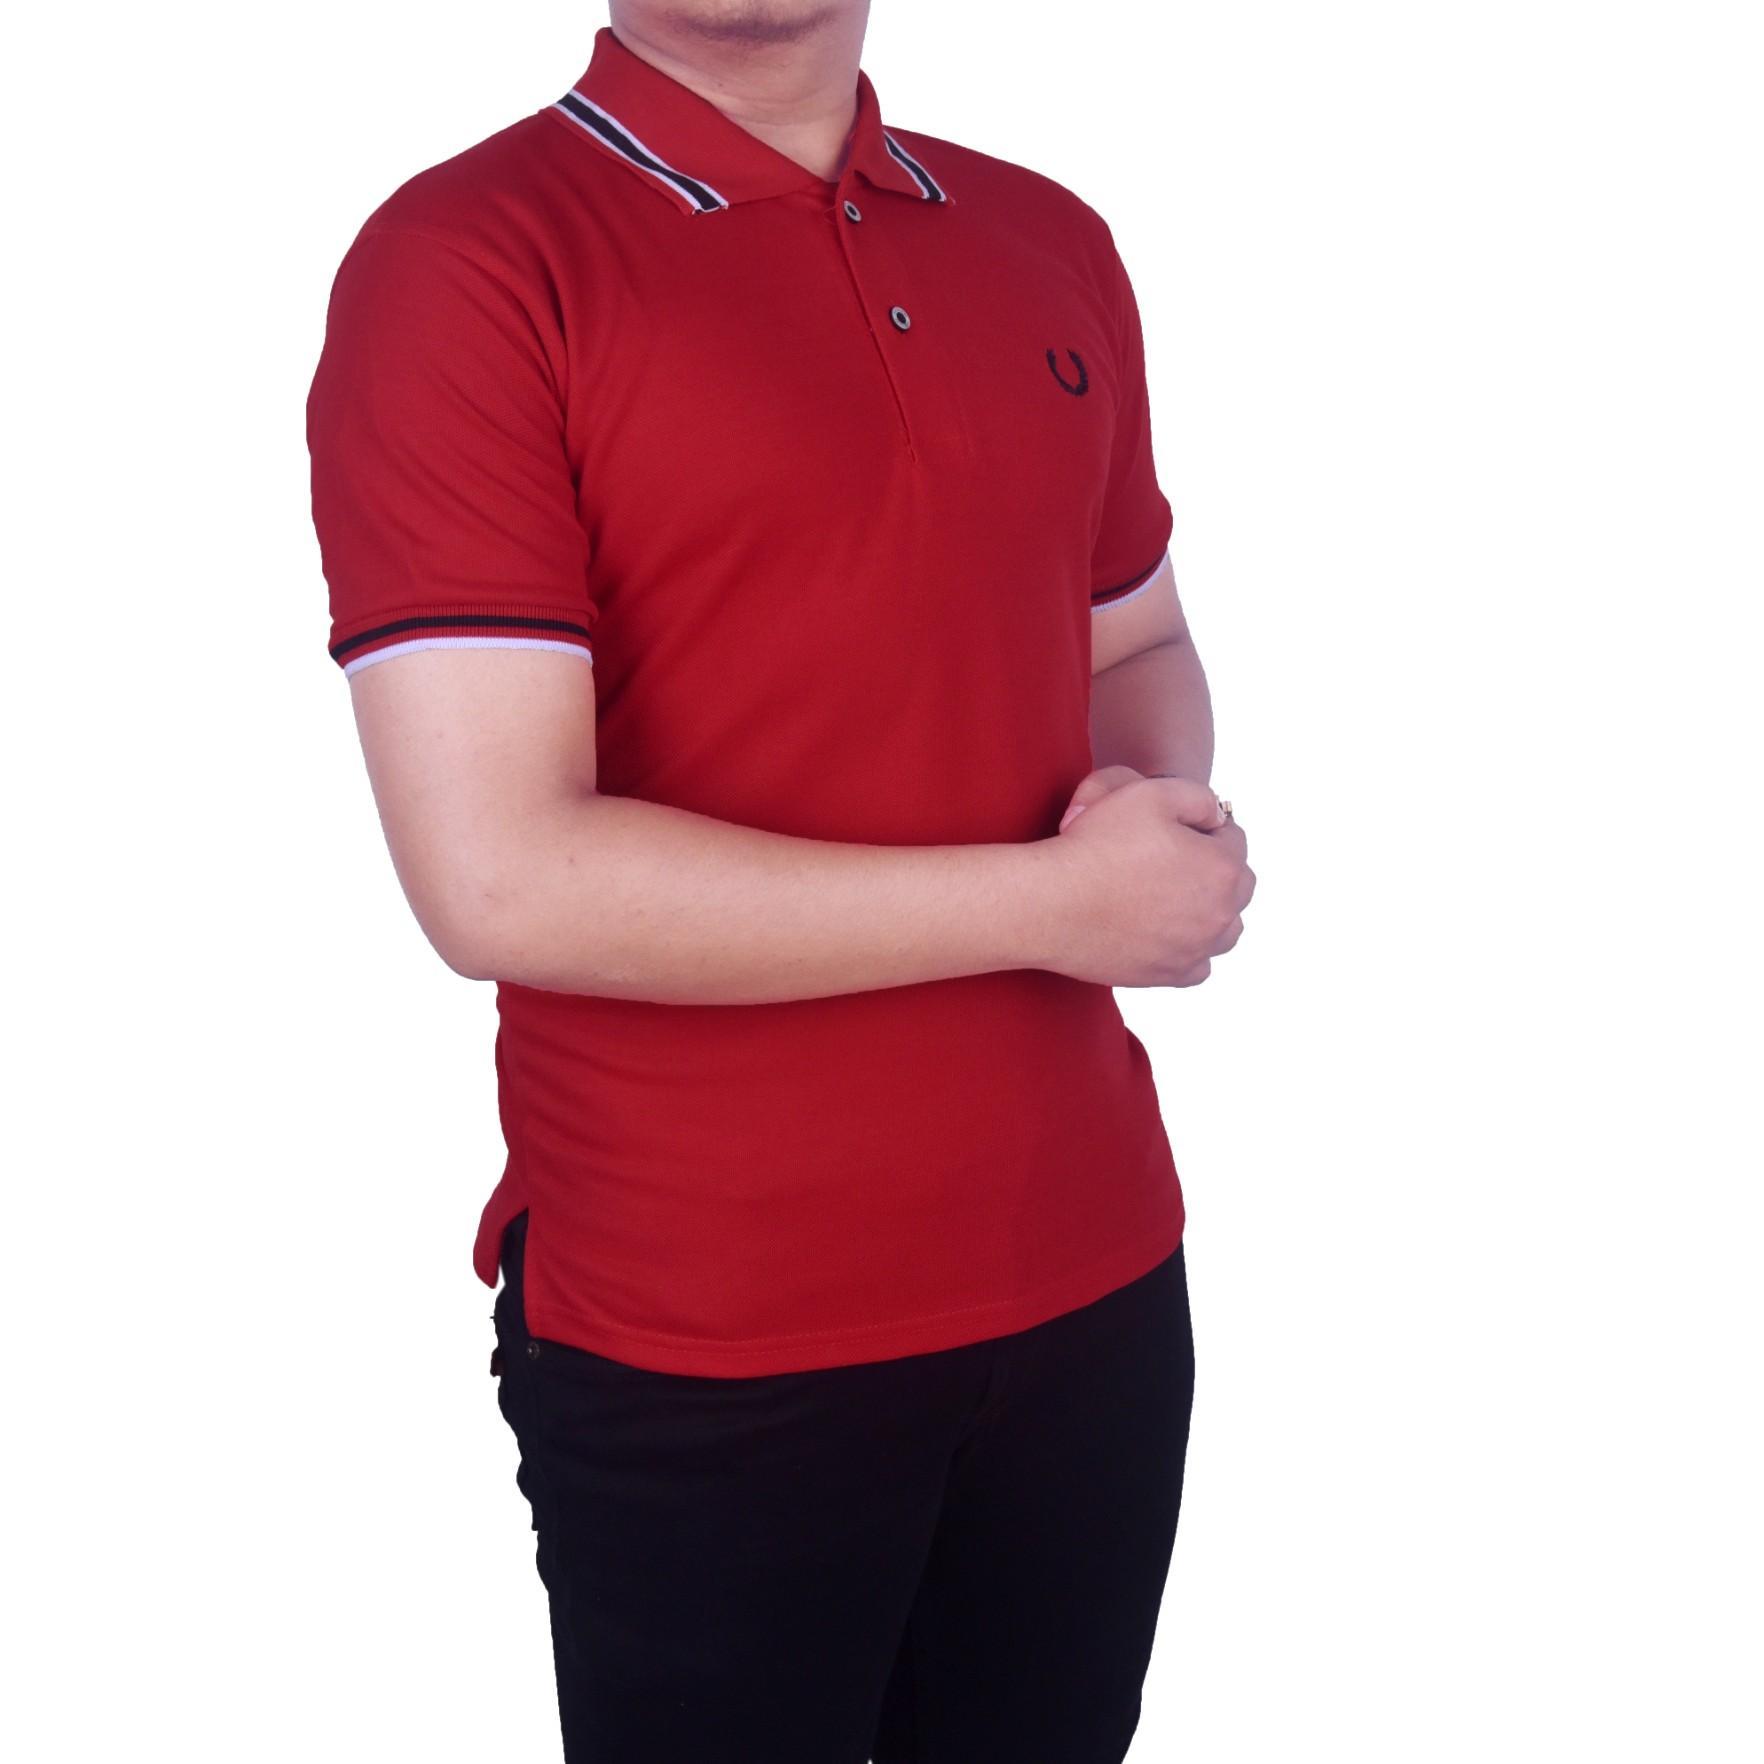 Atasan Dgm Fashion1 Daftar Harga Desember 2018 Fantasia T Shirt Pria Second Flash Hitam Baju Kaos Kerah Polos Merah Polo Sanghai